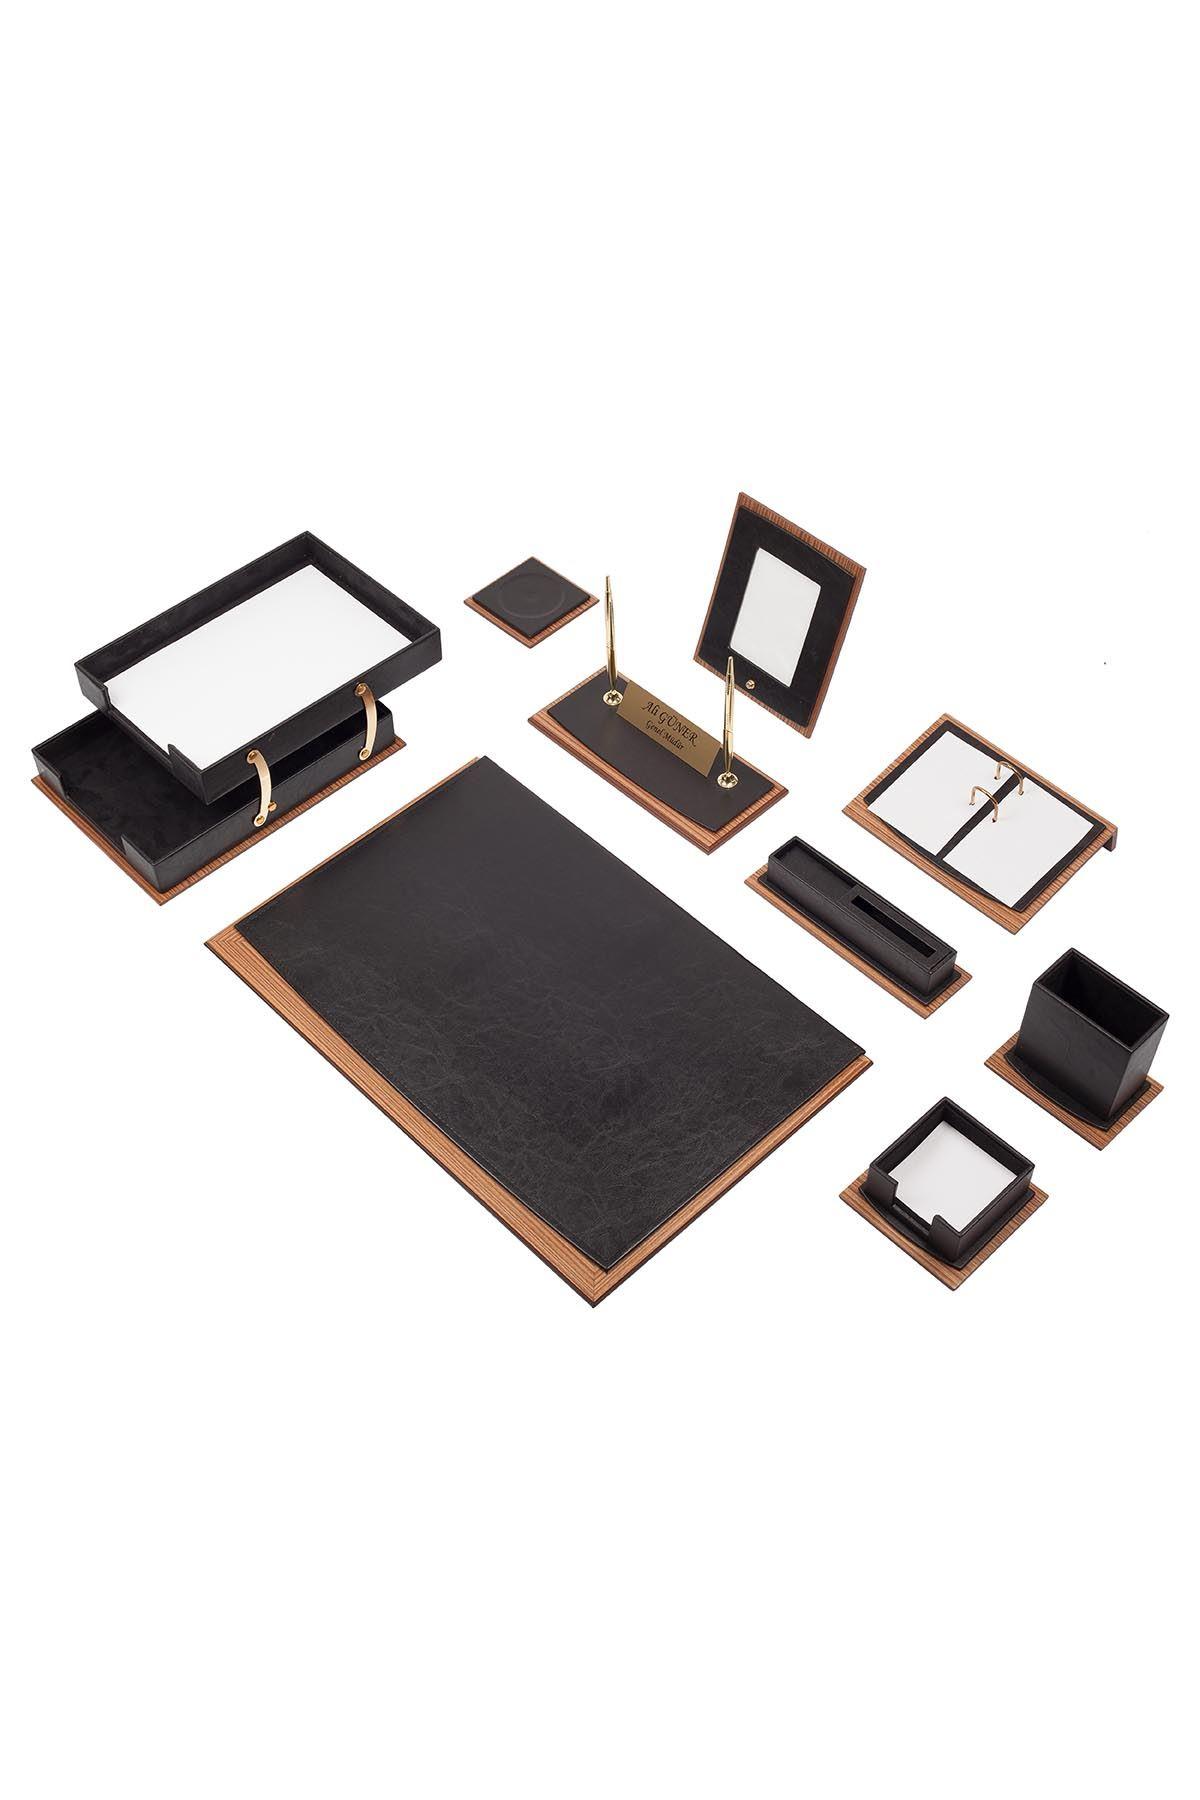 Star Lux Leather Desk Set Black 11 Accessories